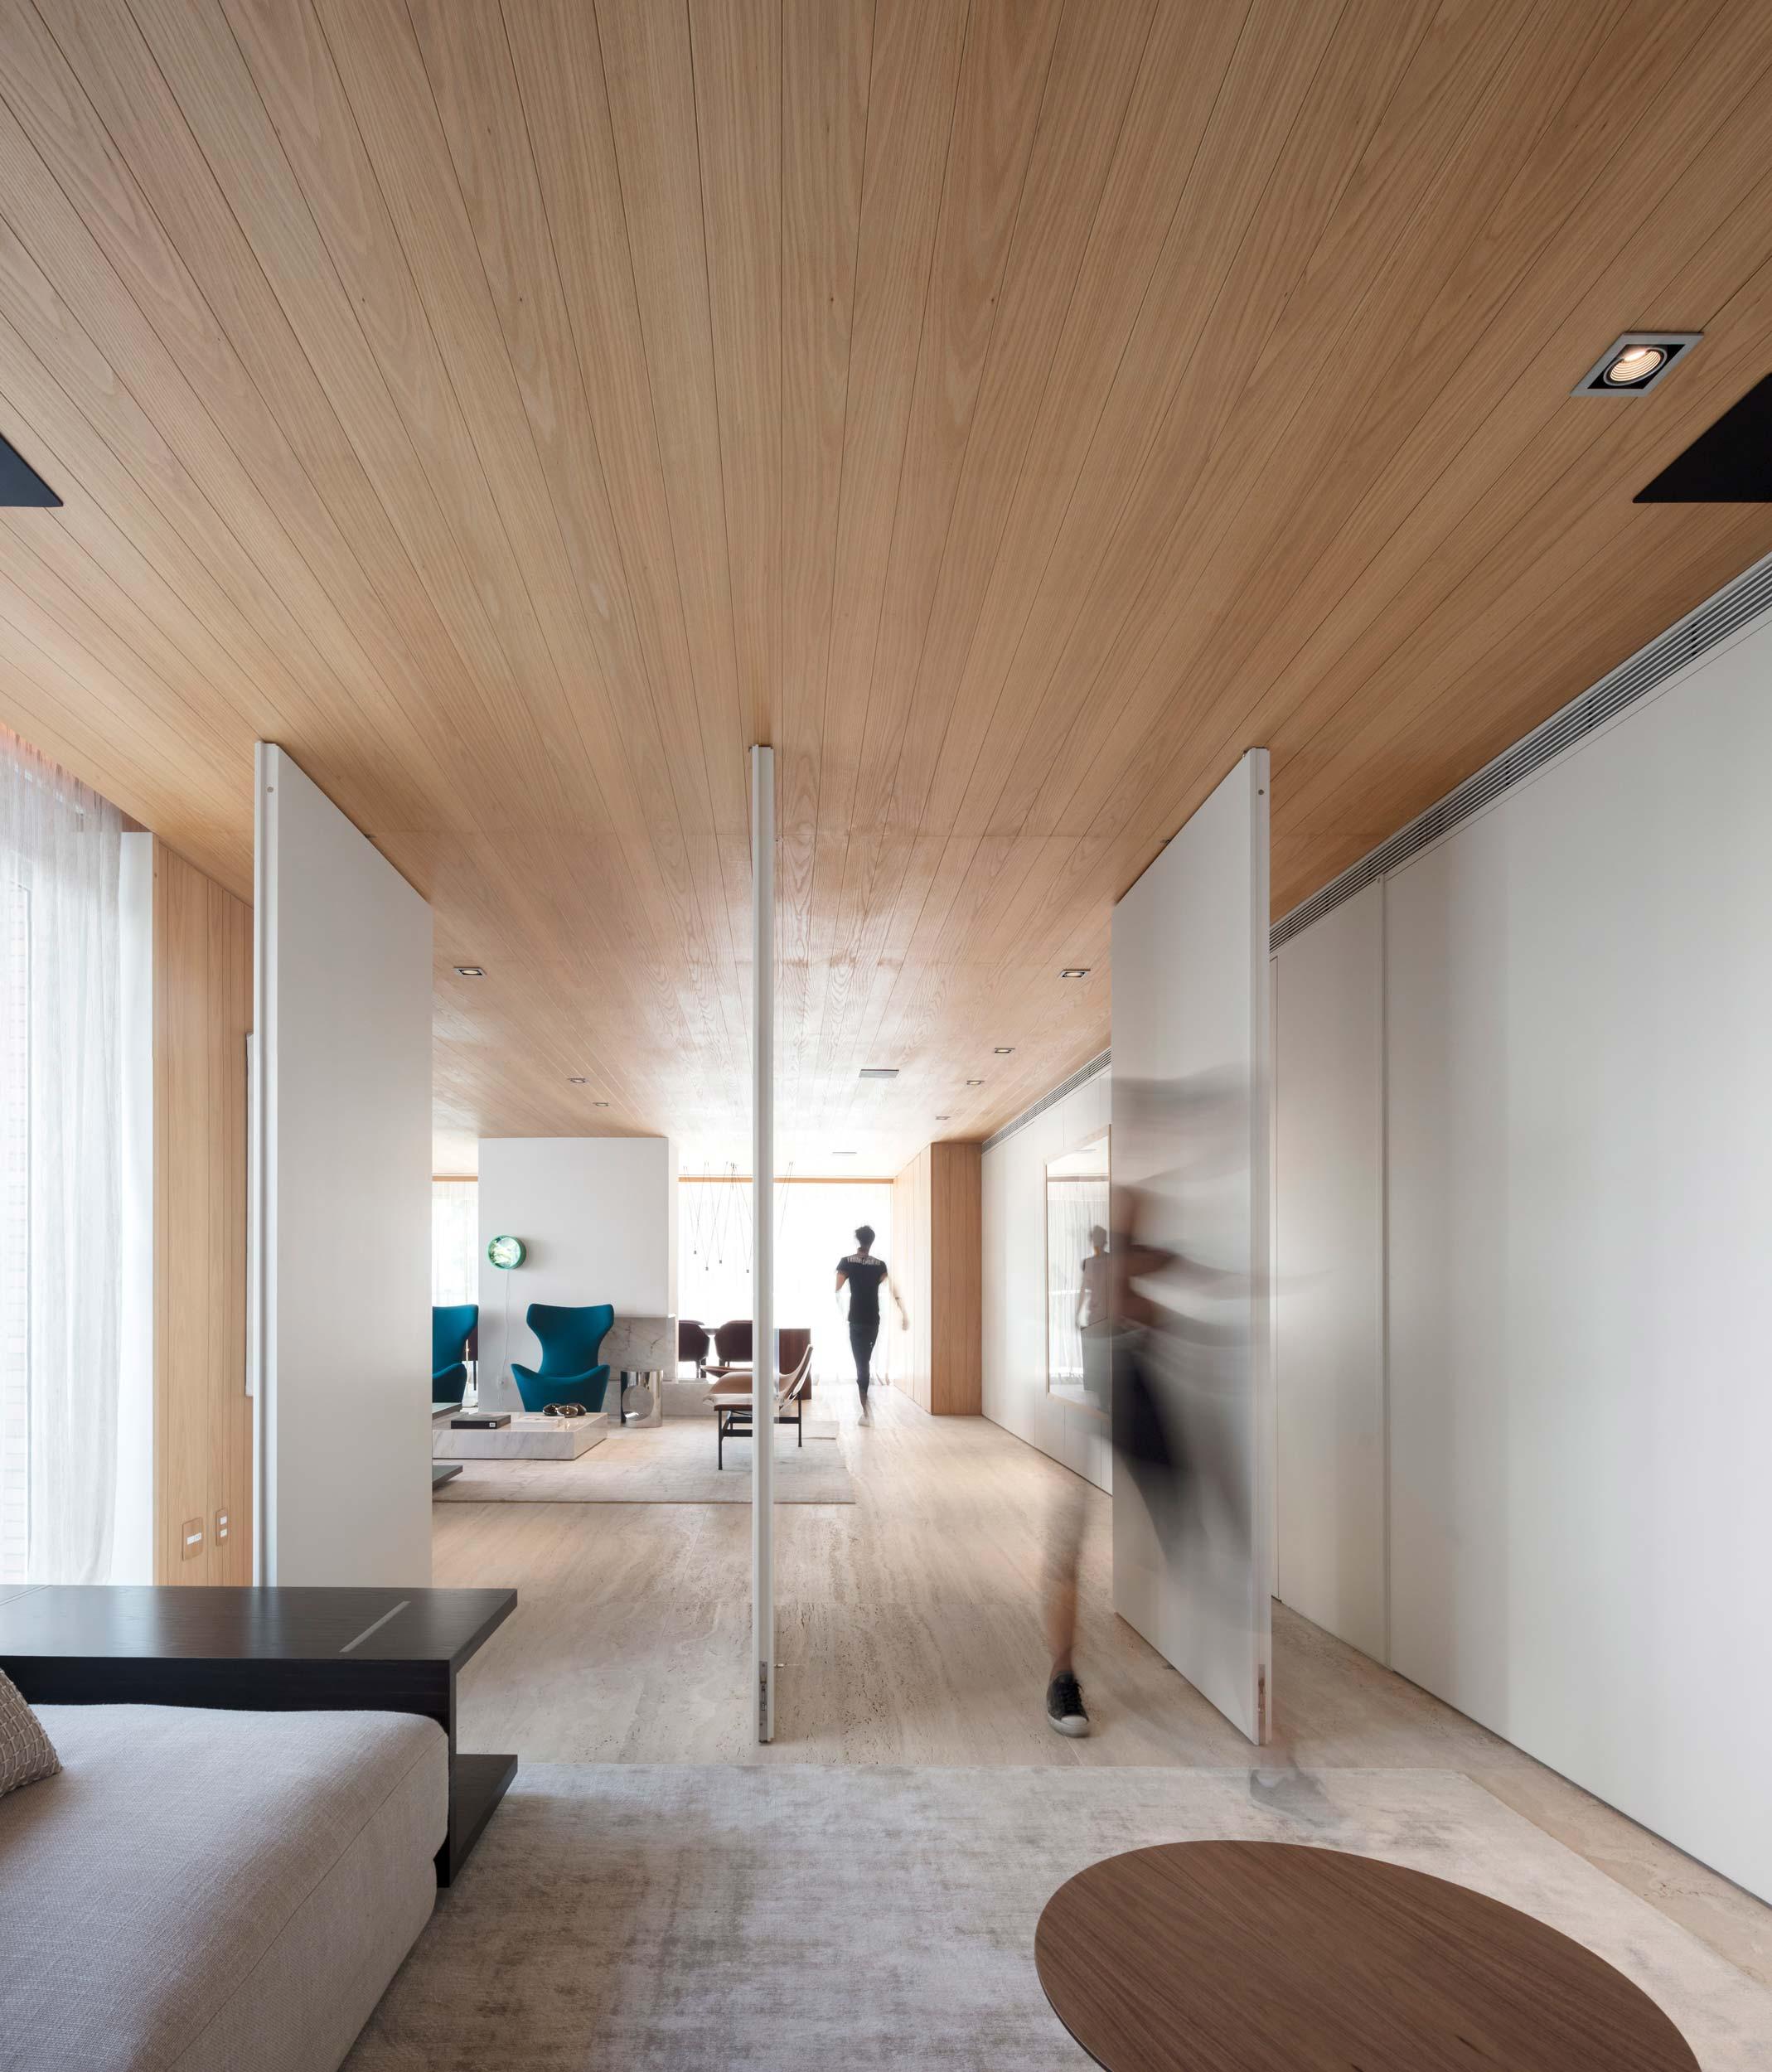 projeto-eretz-fernanda-marques-arquiteta-5.JPG